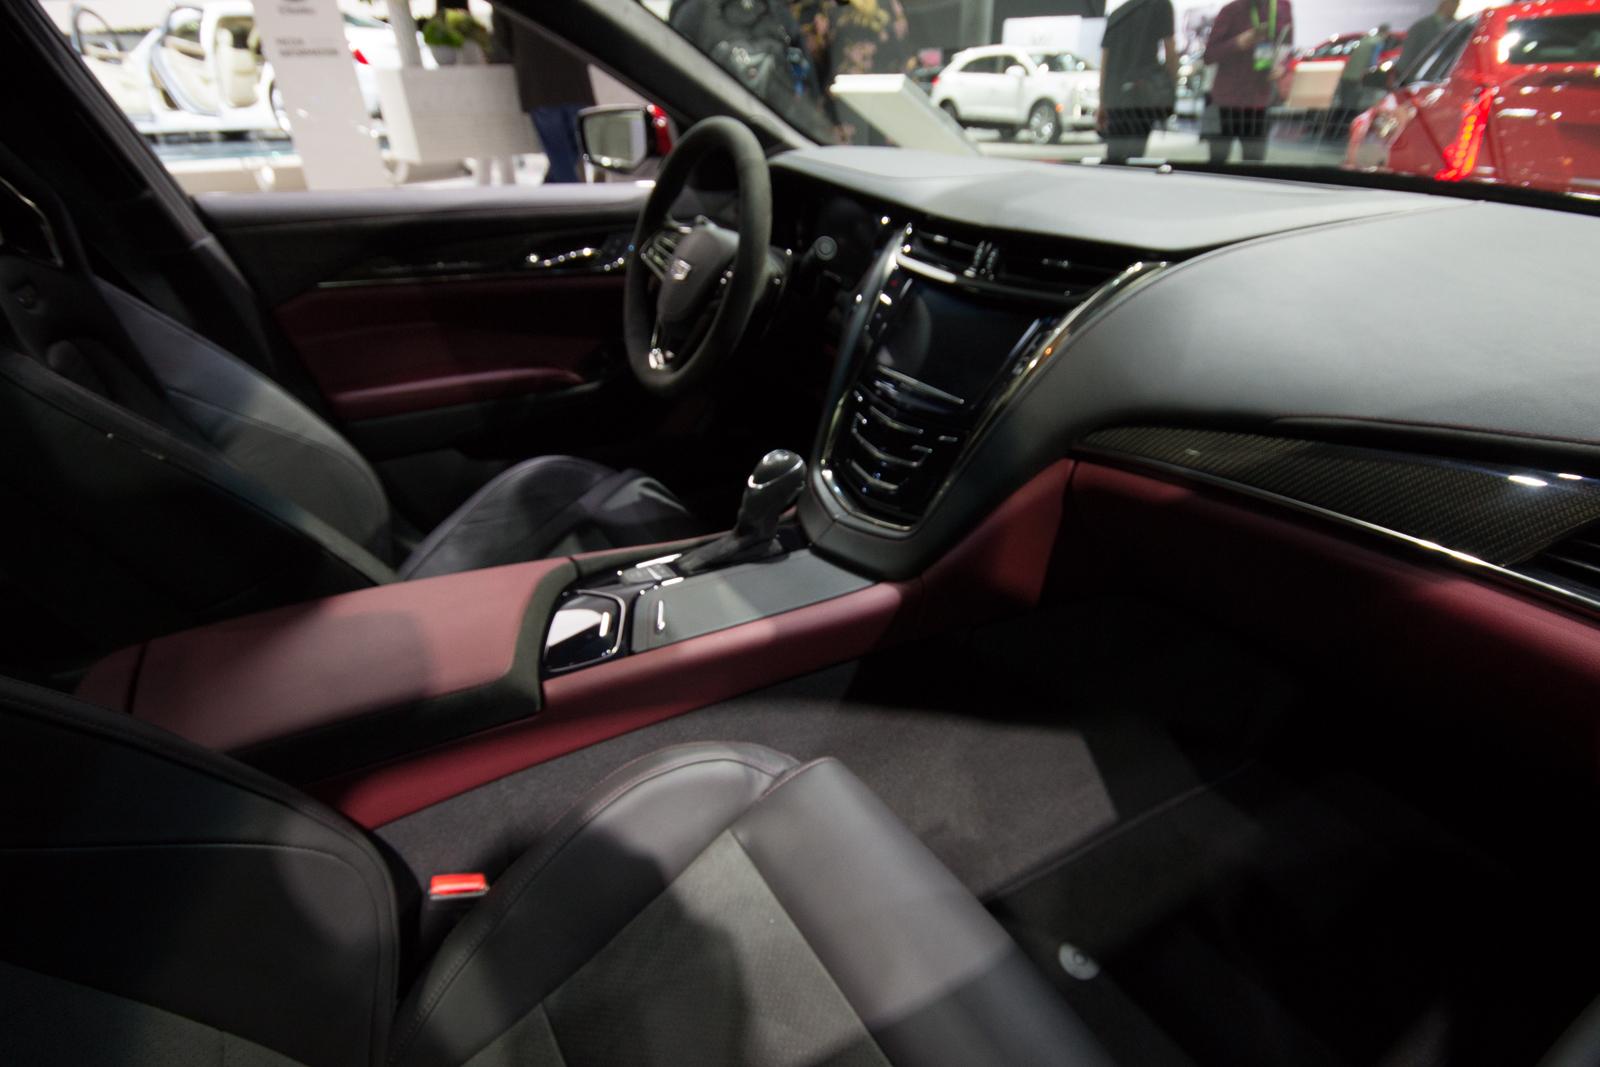 Cadillac CTS-V IMSA Championship Edition Found Loitering at the LA